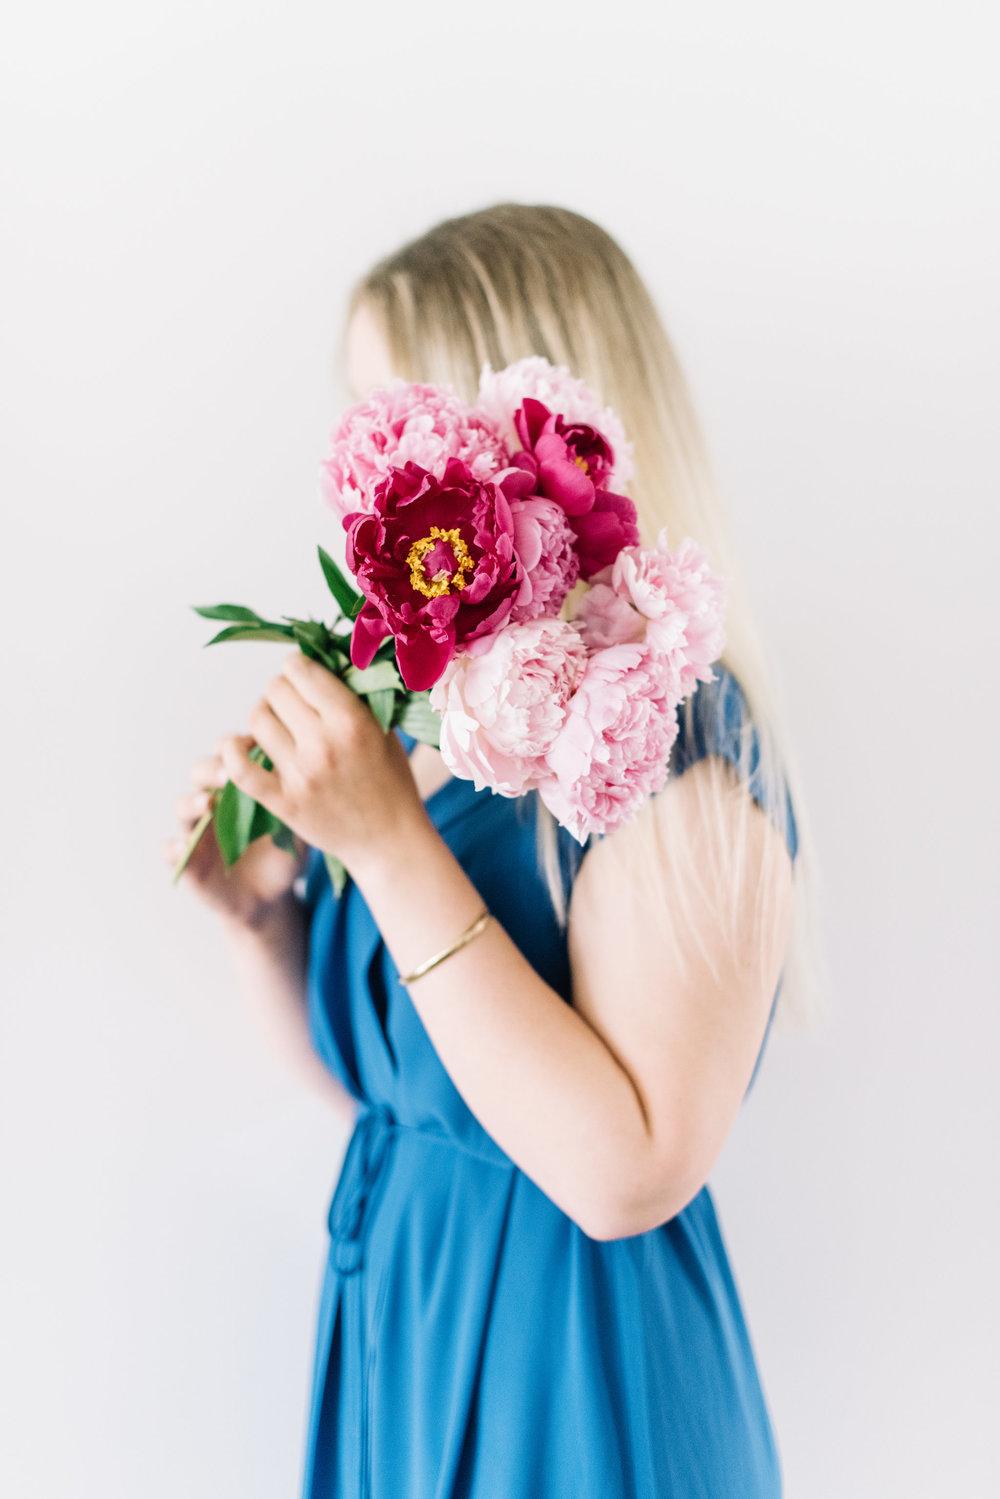 pink peonies, blue dress